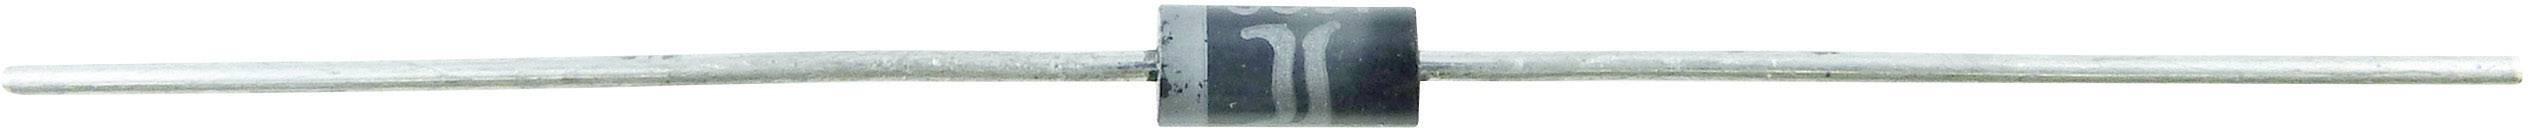 Diotec HV5 HV5 200 mA, 5000 V